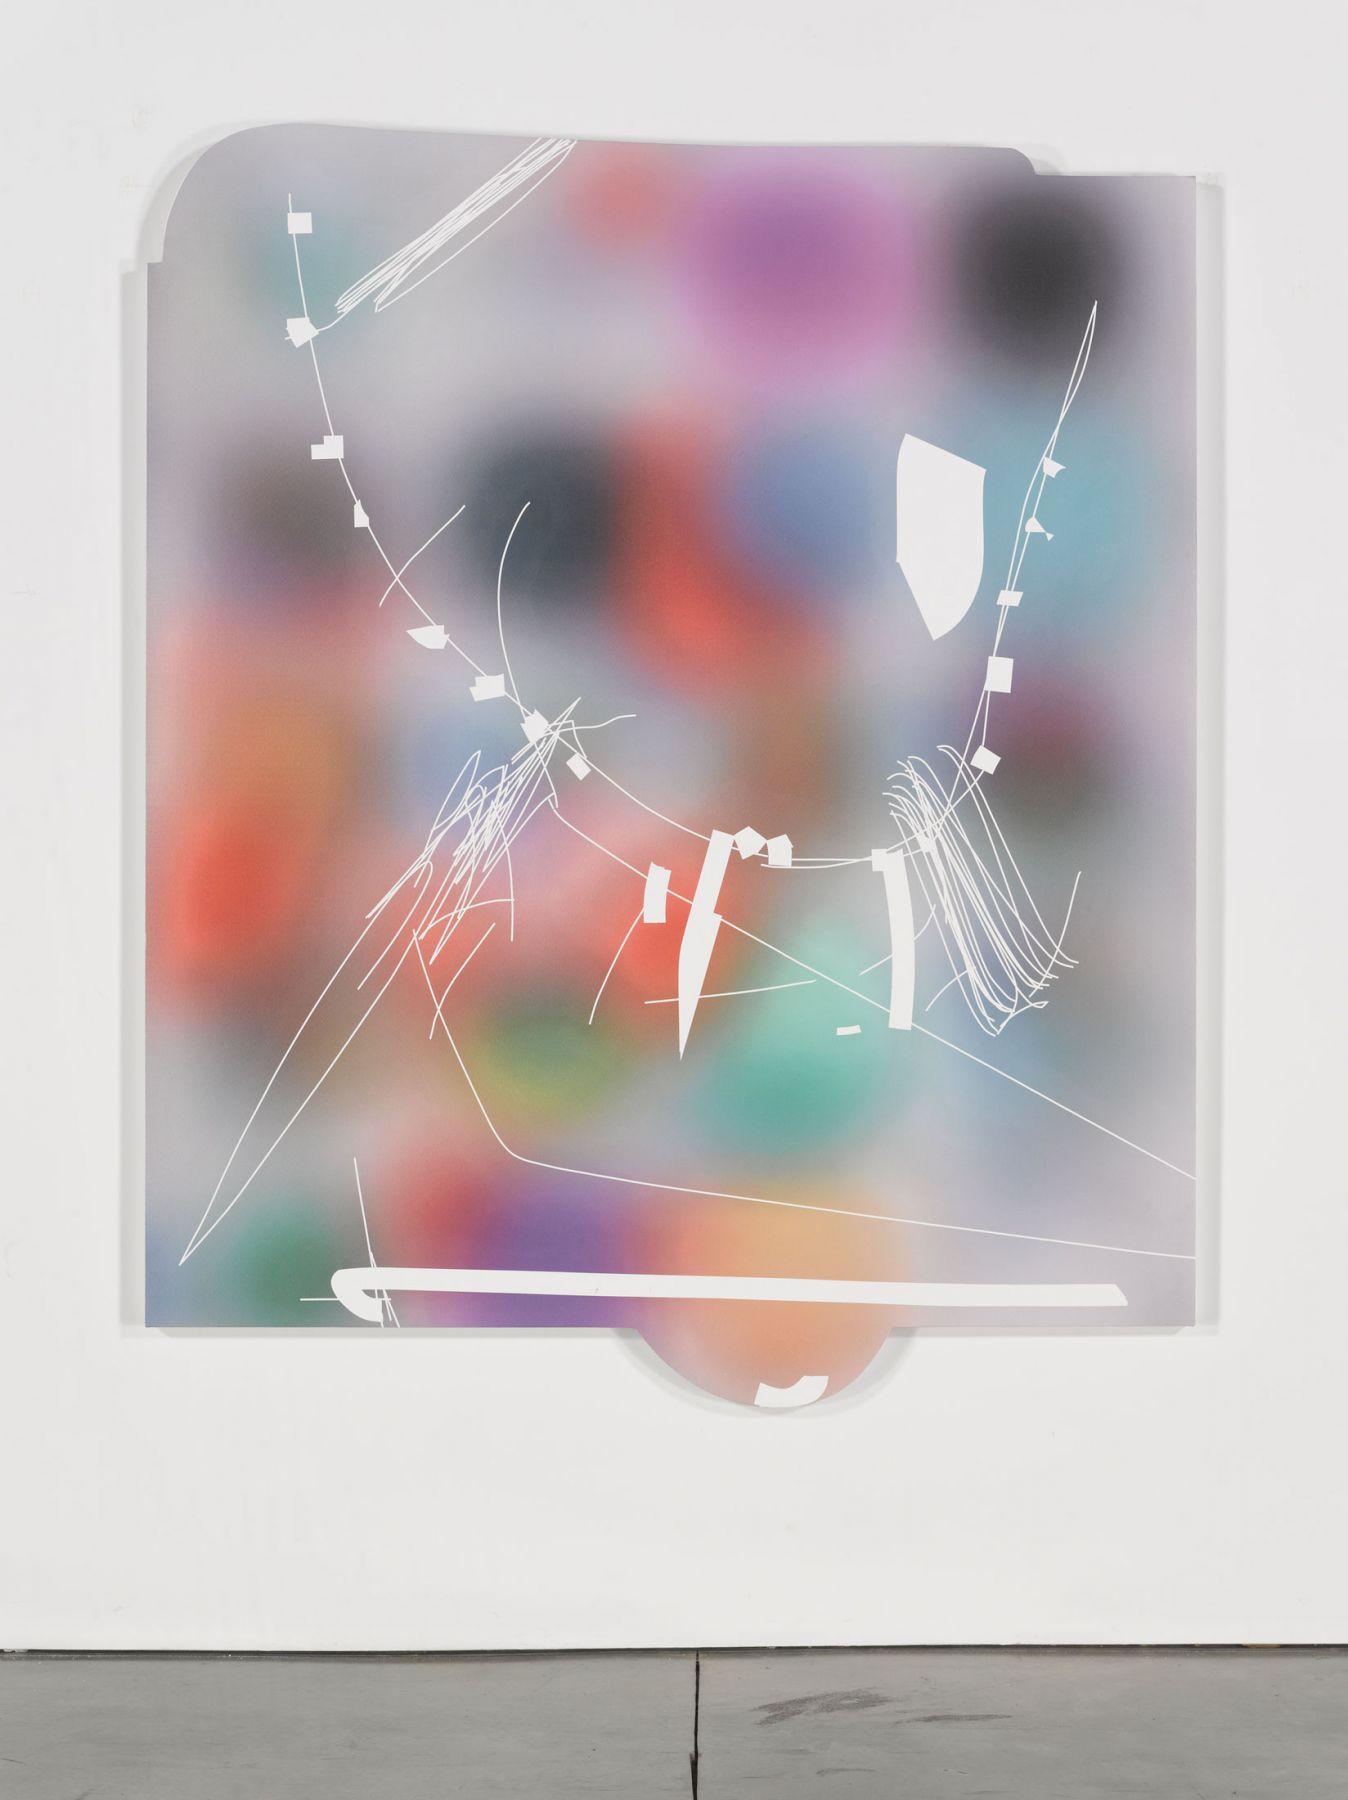 Jeff Elrod, Rubber-Miro, 2015